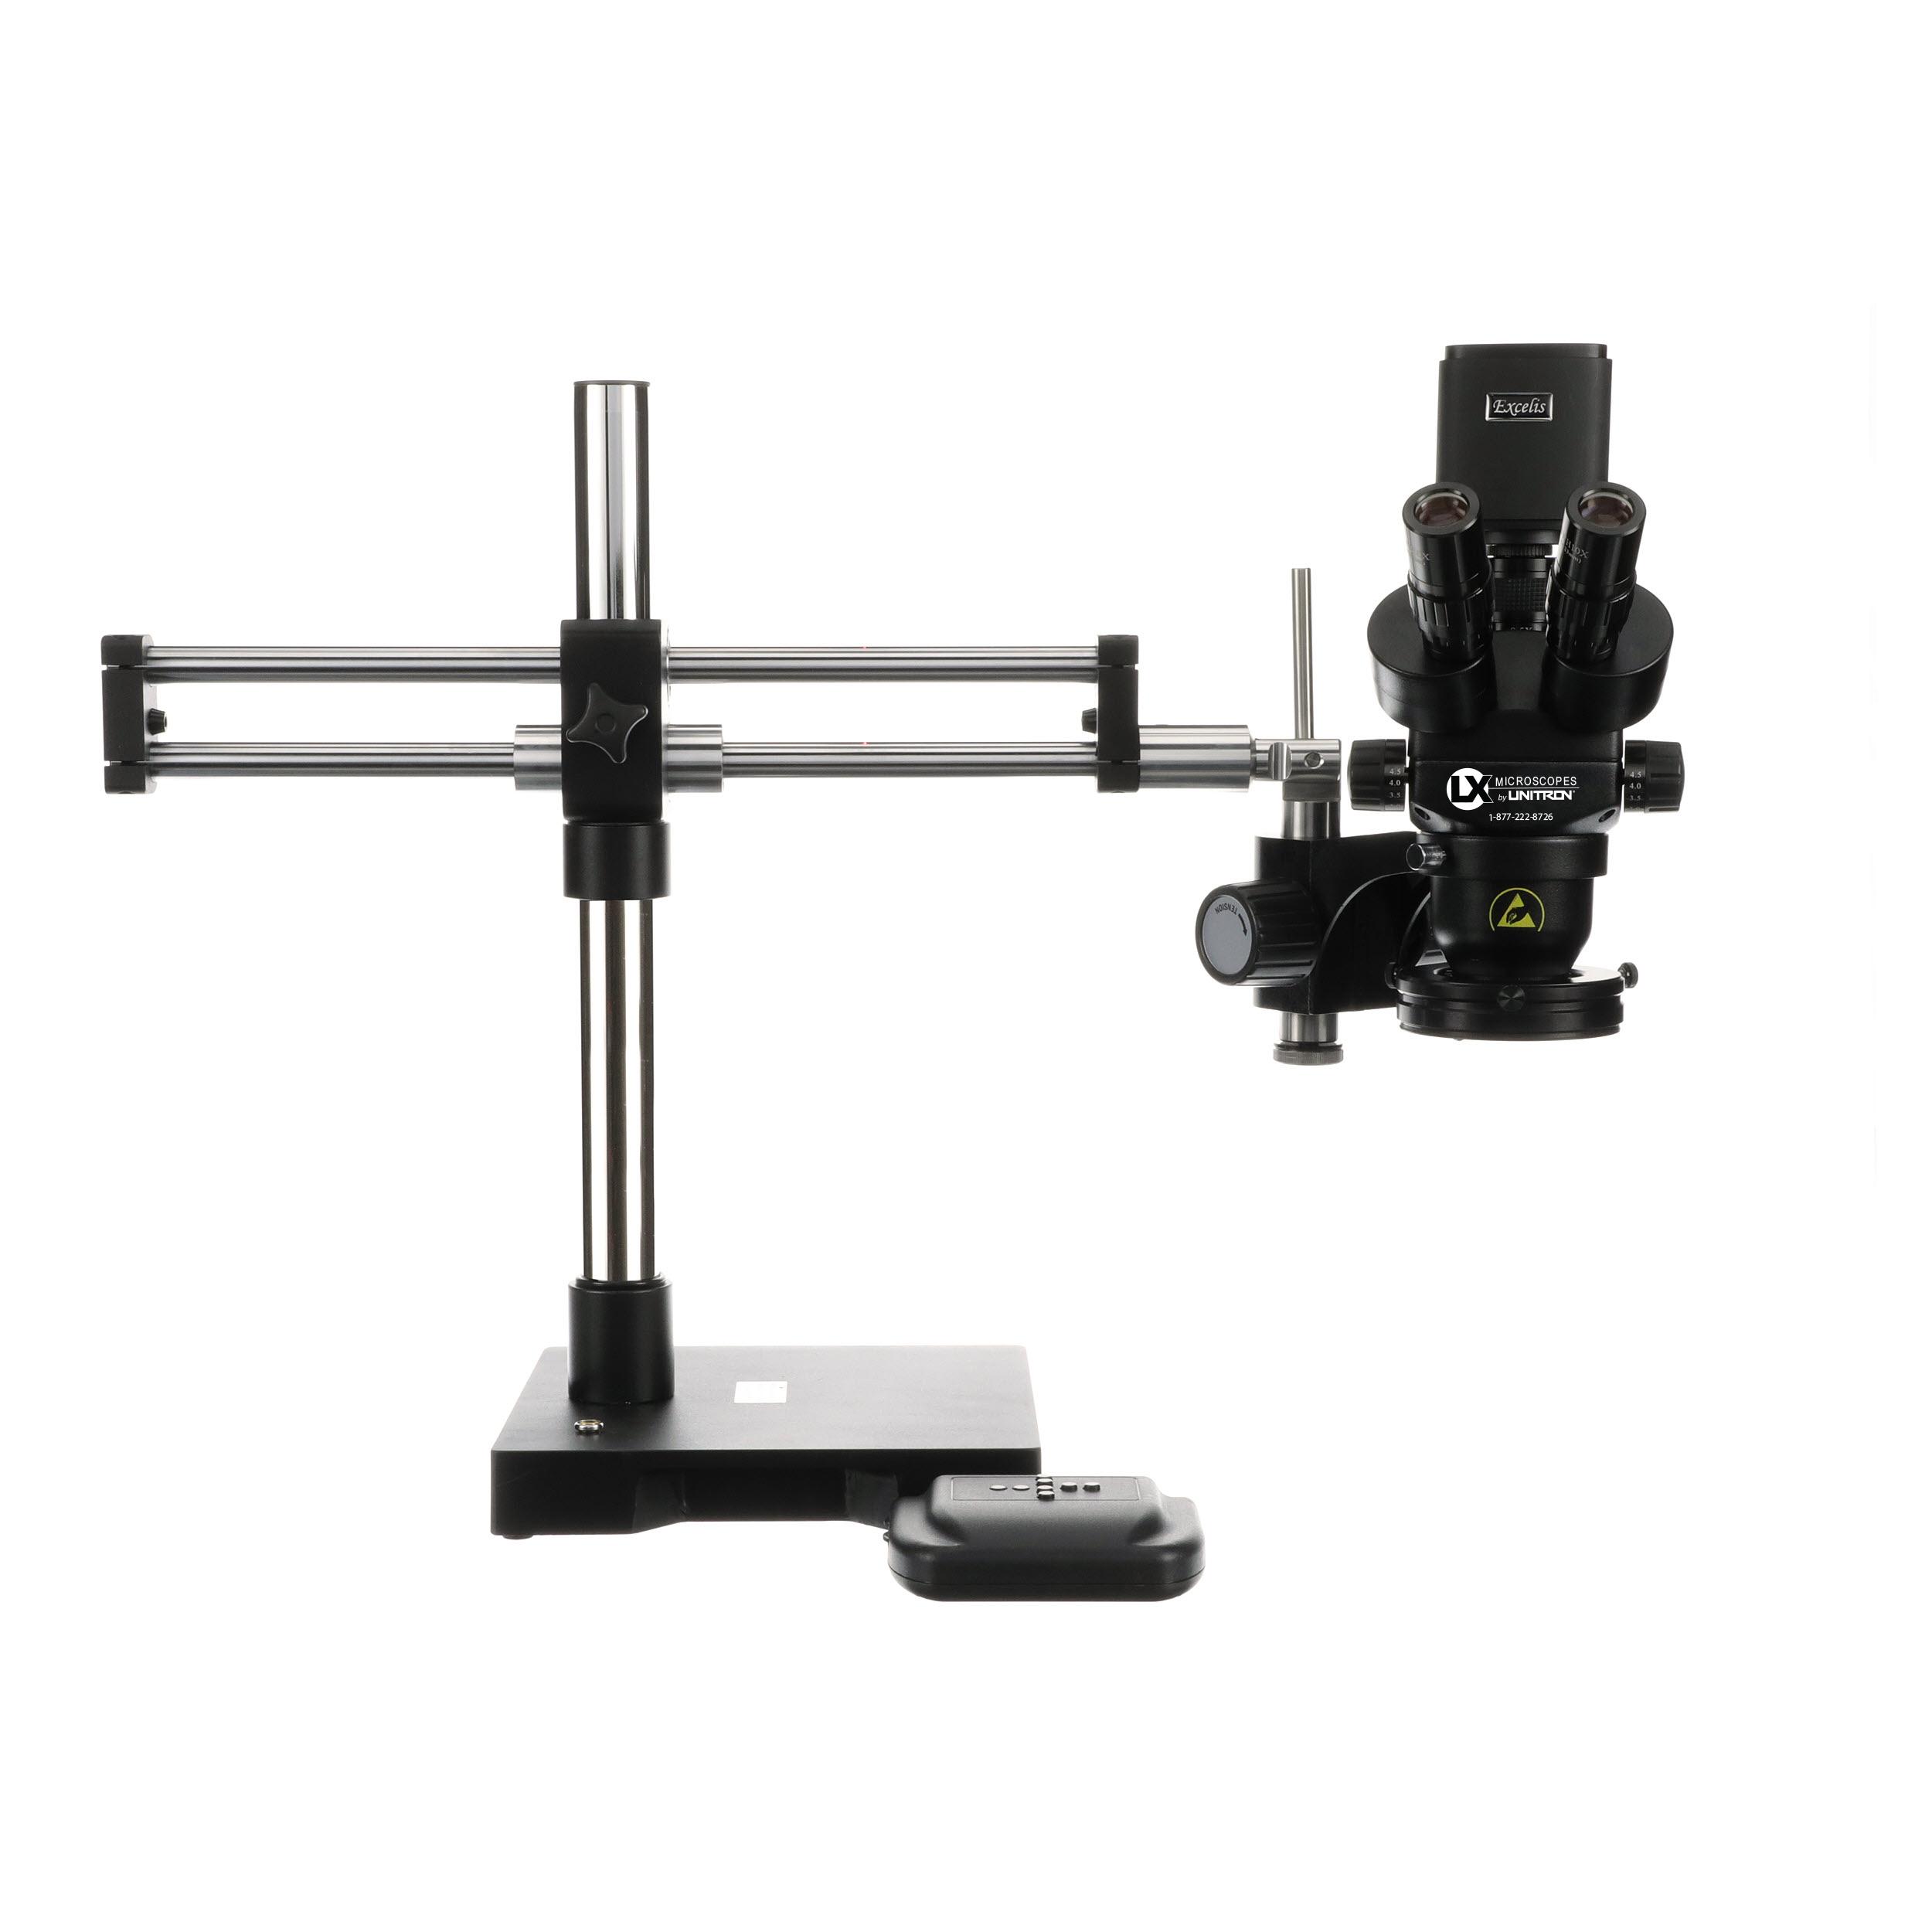 Stereo Microscopes with Digital Cameras